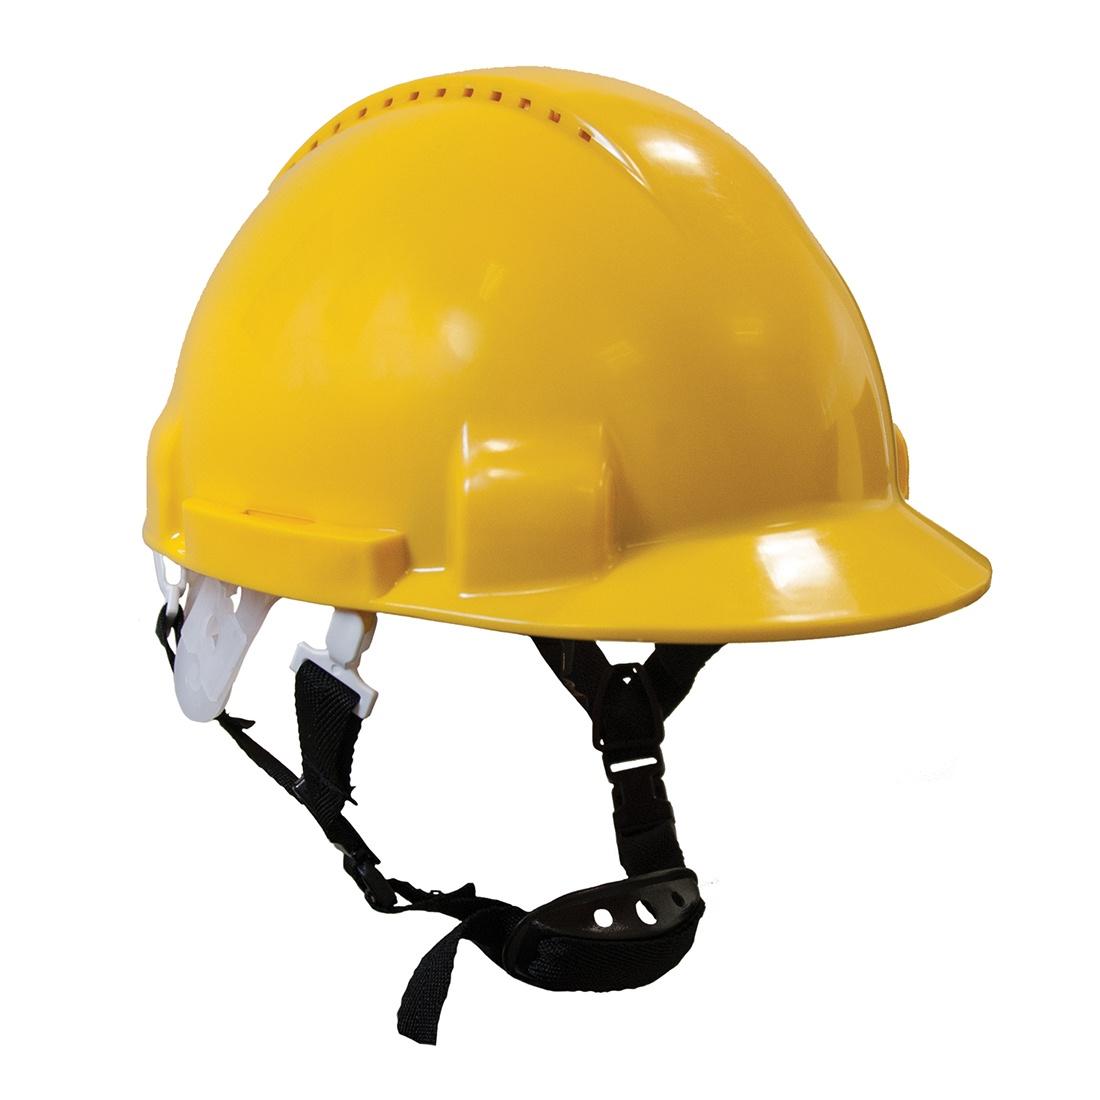 Portwest Monterosa Safety Helmet